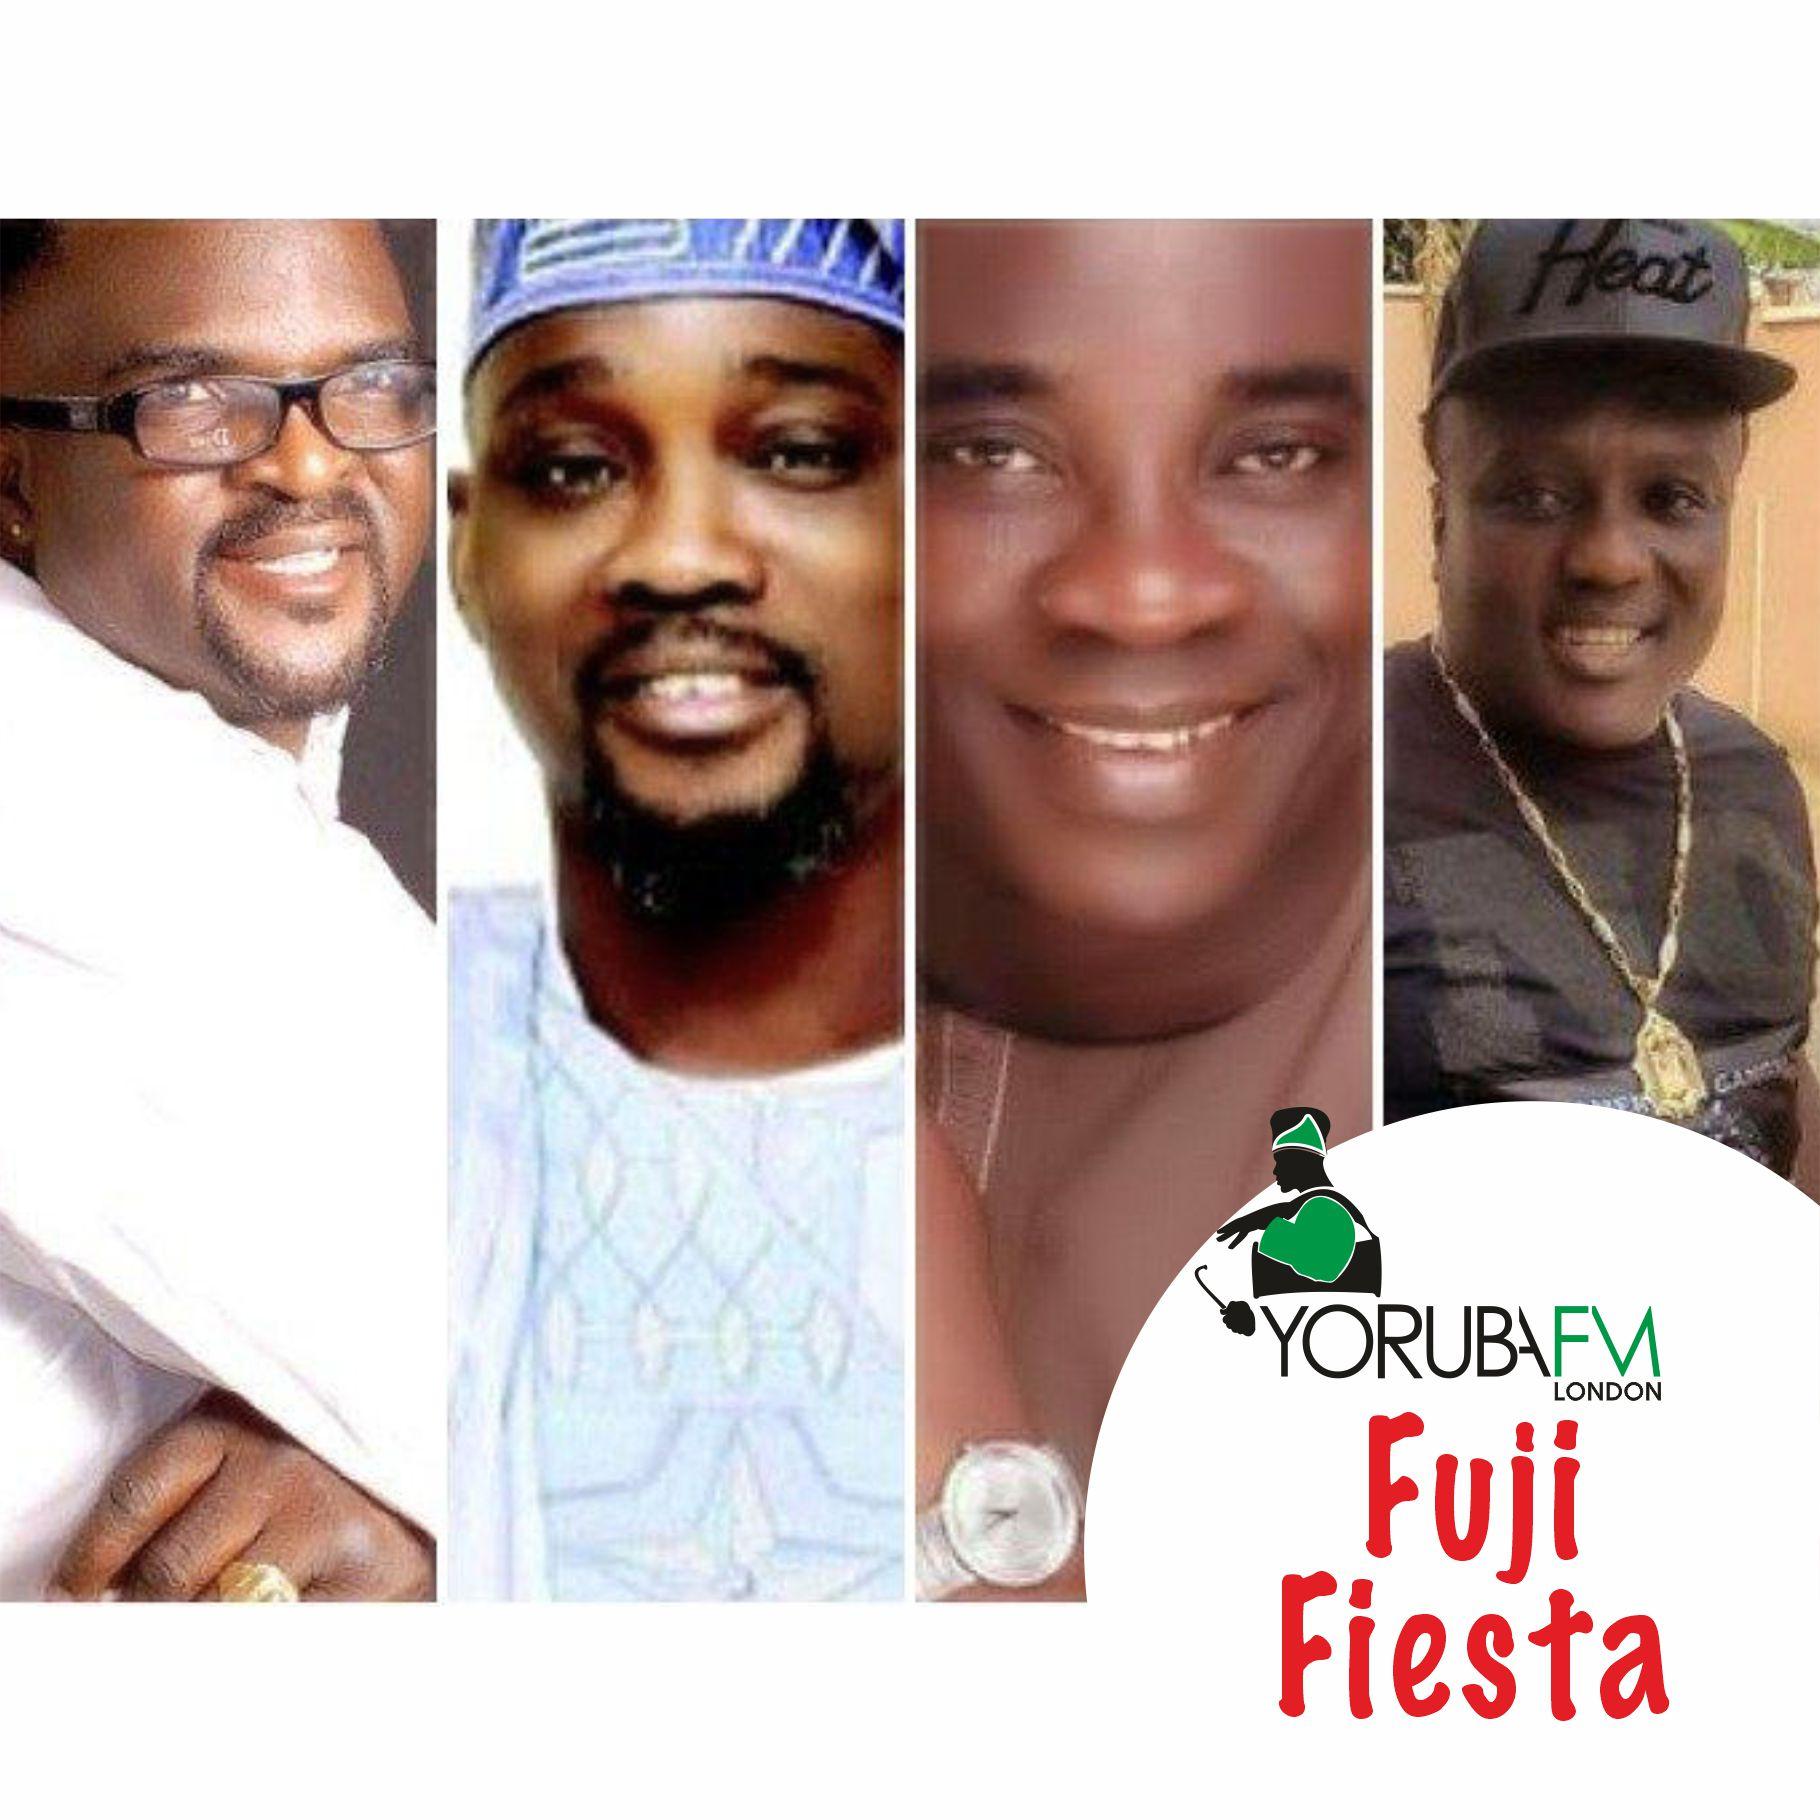 Yoruba-FM-FUJI FIESTA.